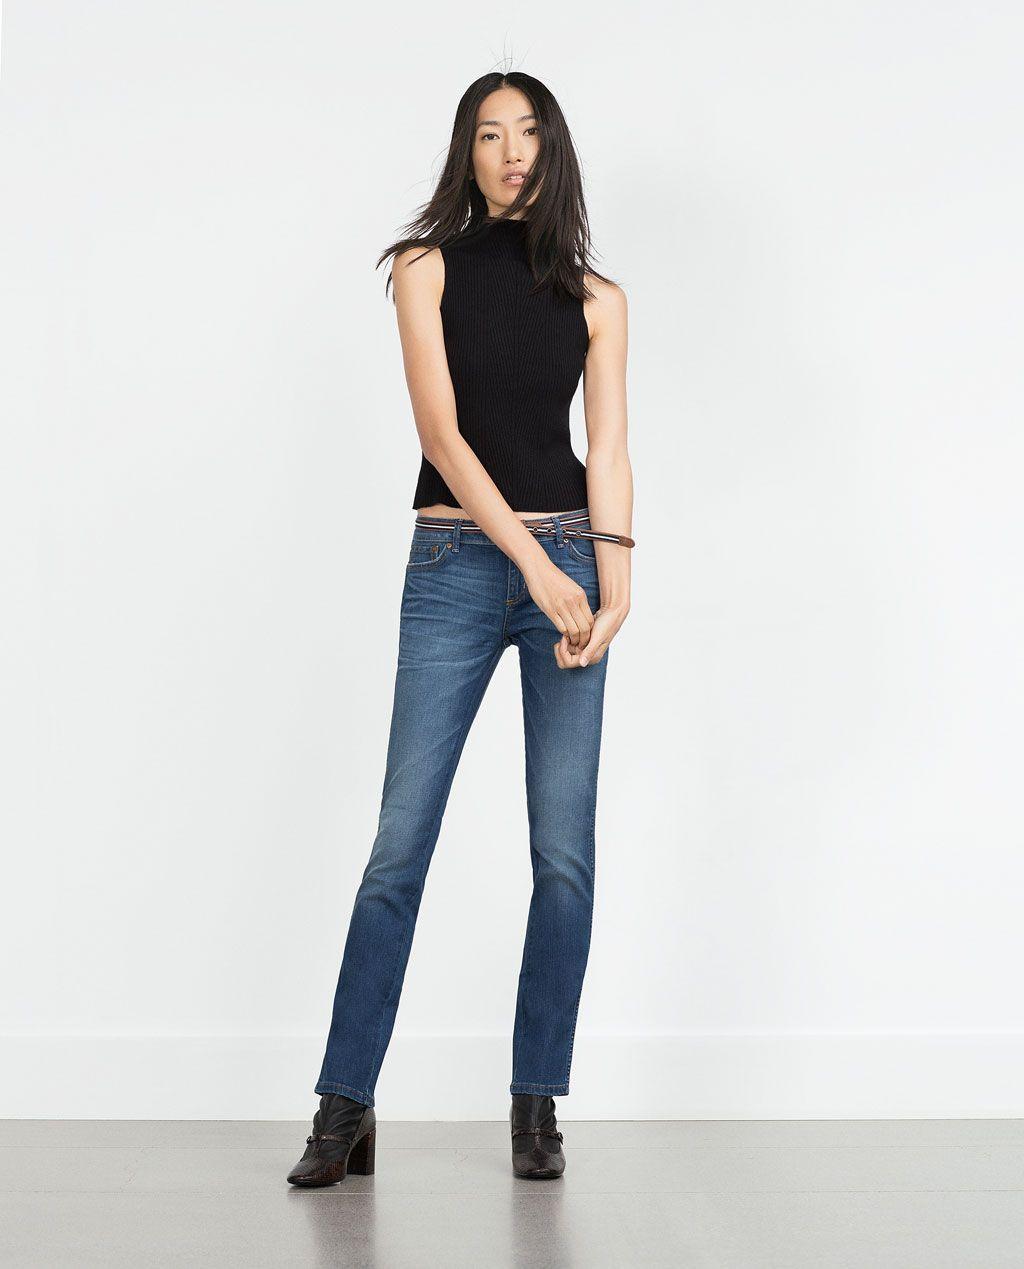 Zara Mujer Otoño Pantalón Denim RectoRopa EHebWD9IY2